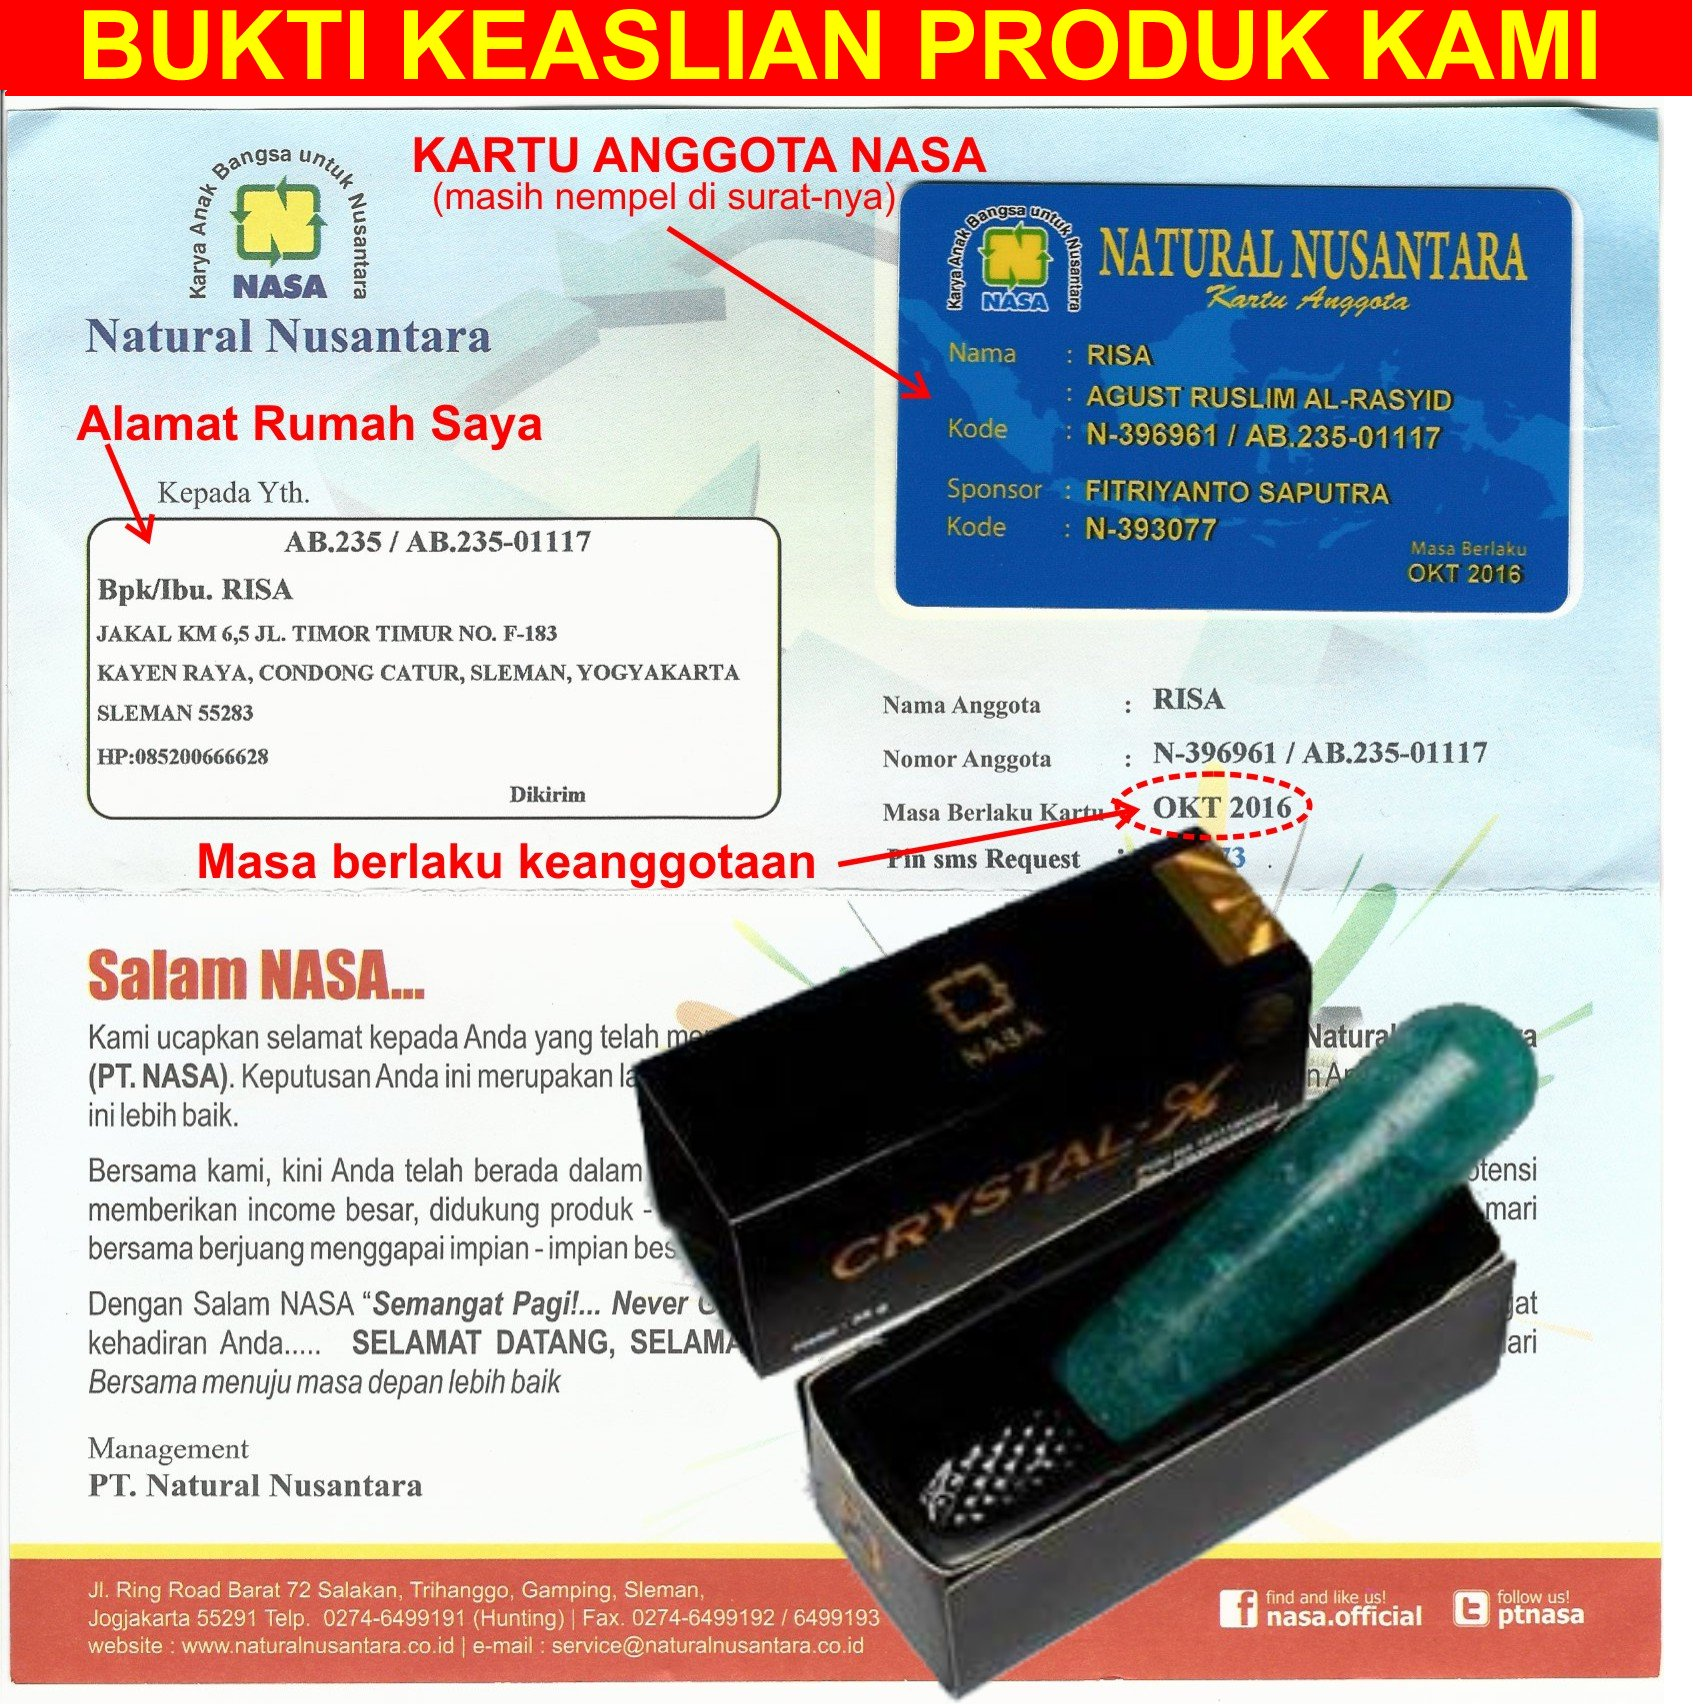 Cristal Xnasa Original 1 Kotak Daftar Harga Terlengkap Indonesia Crystal X Ori Nasa Kristal Asli